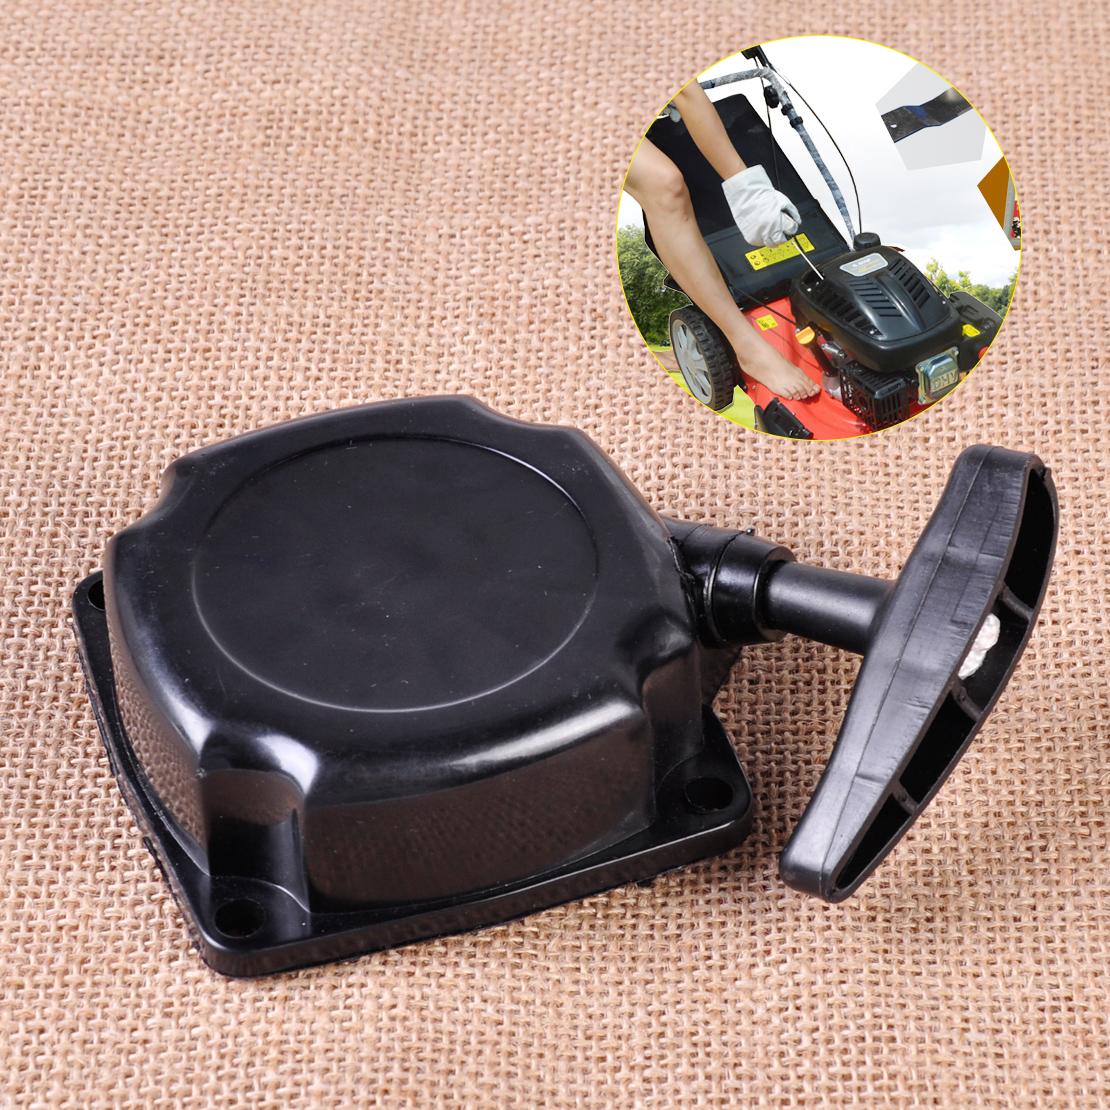 Recoil Pull Starter Compatible with 33cc 36cc 43cc 49cc 2 Stroke Pocket Bike ATV